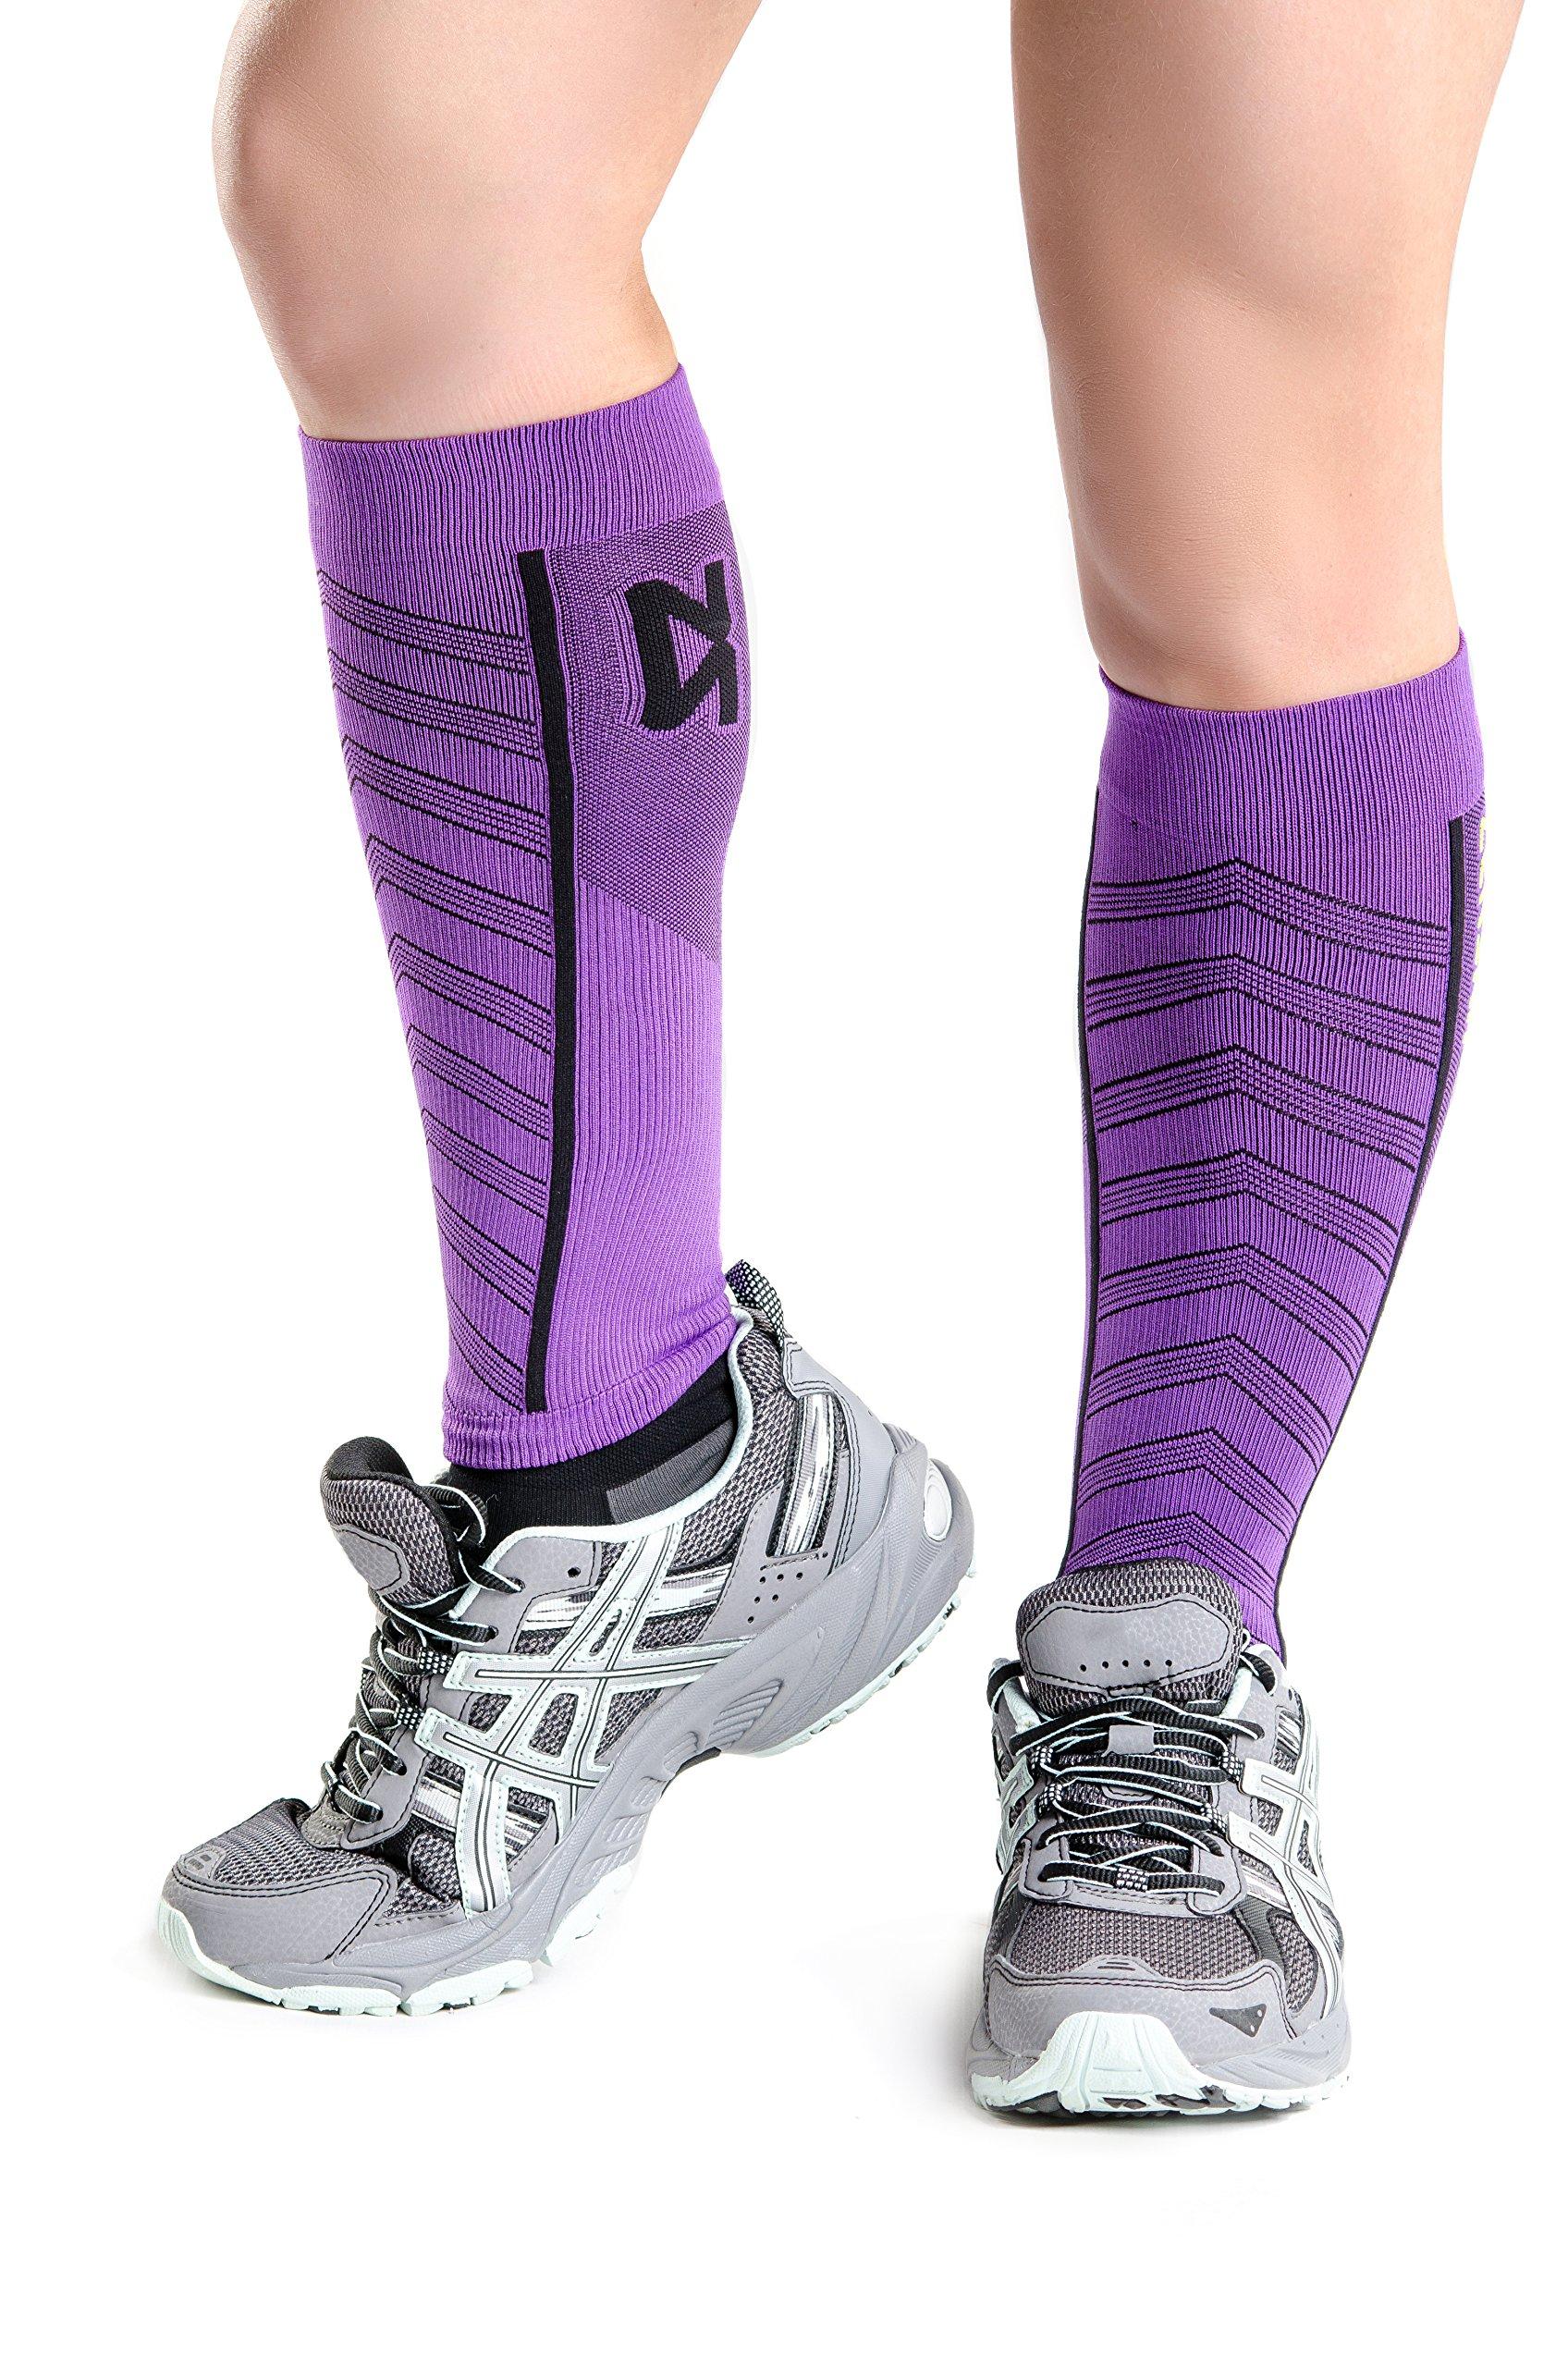 Zensah Featherweight Compression Sleeves, Purple, Medium by Zensah